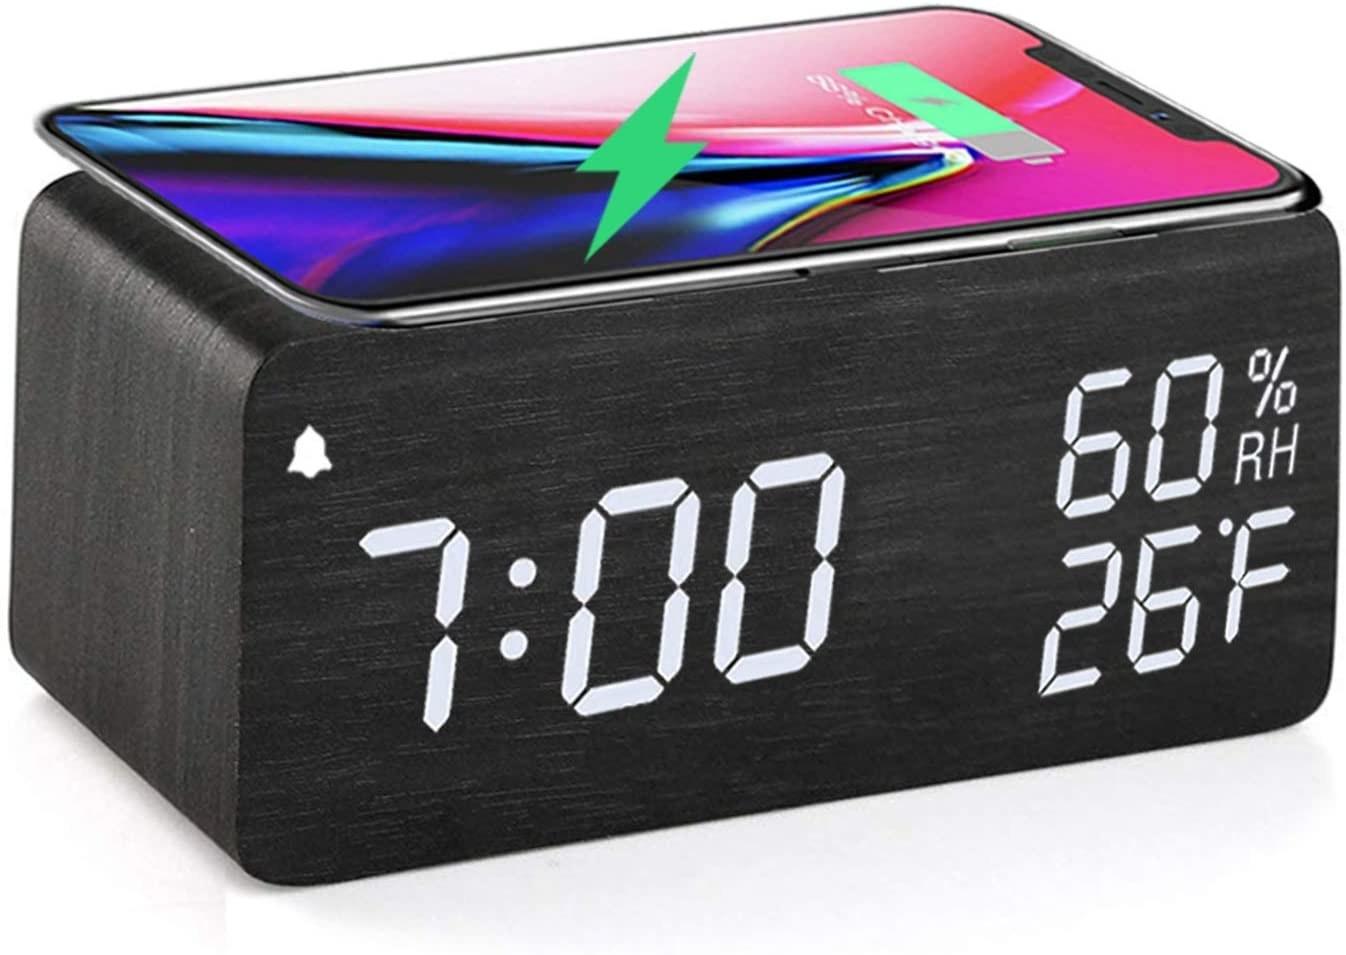 Smartphone wirelessly charging on top of alarm clock